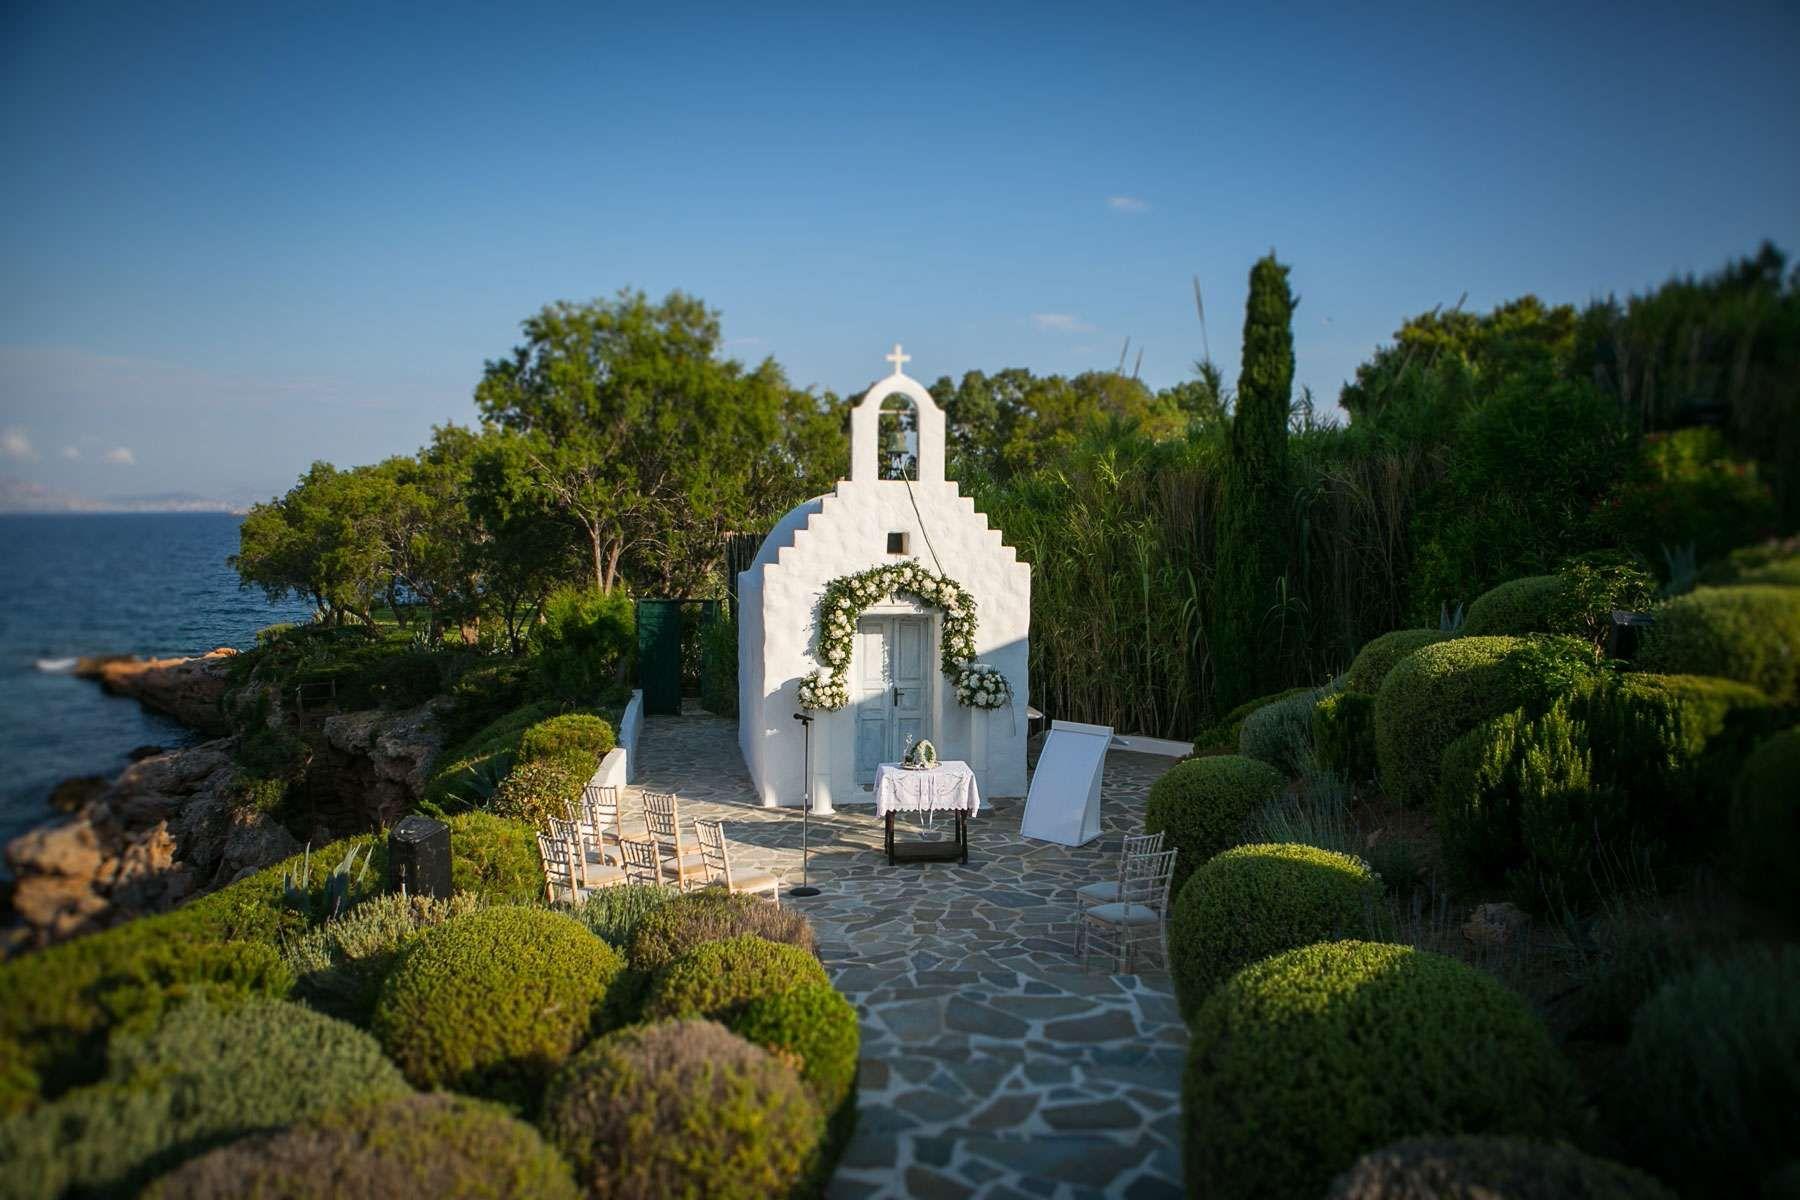 Romantic Wedding by the sea (Island - Athens - Greece ...